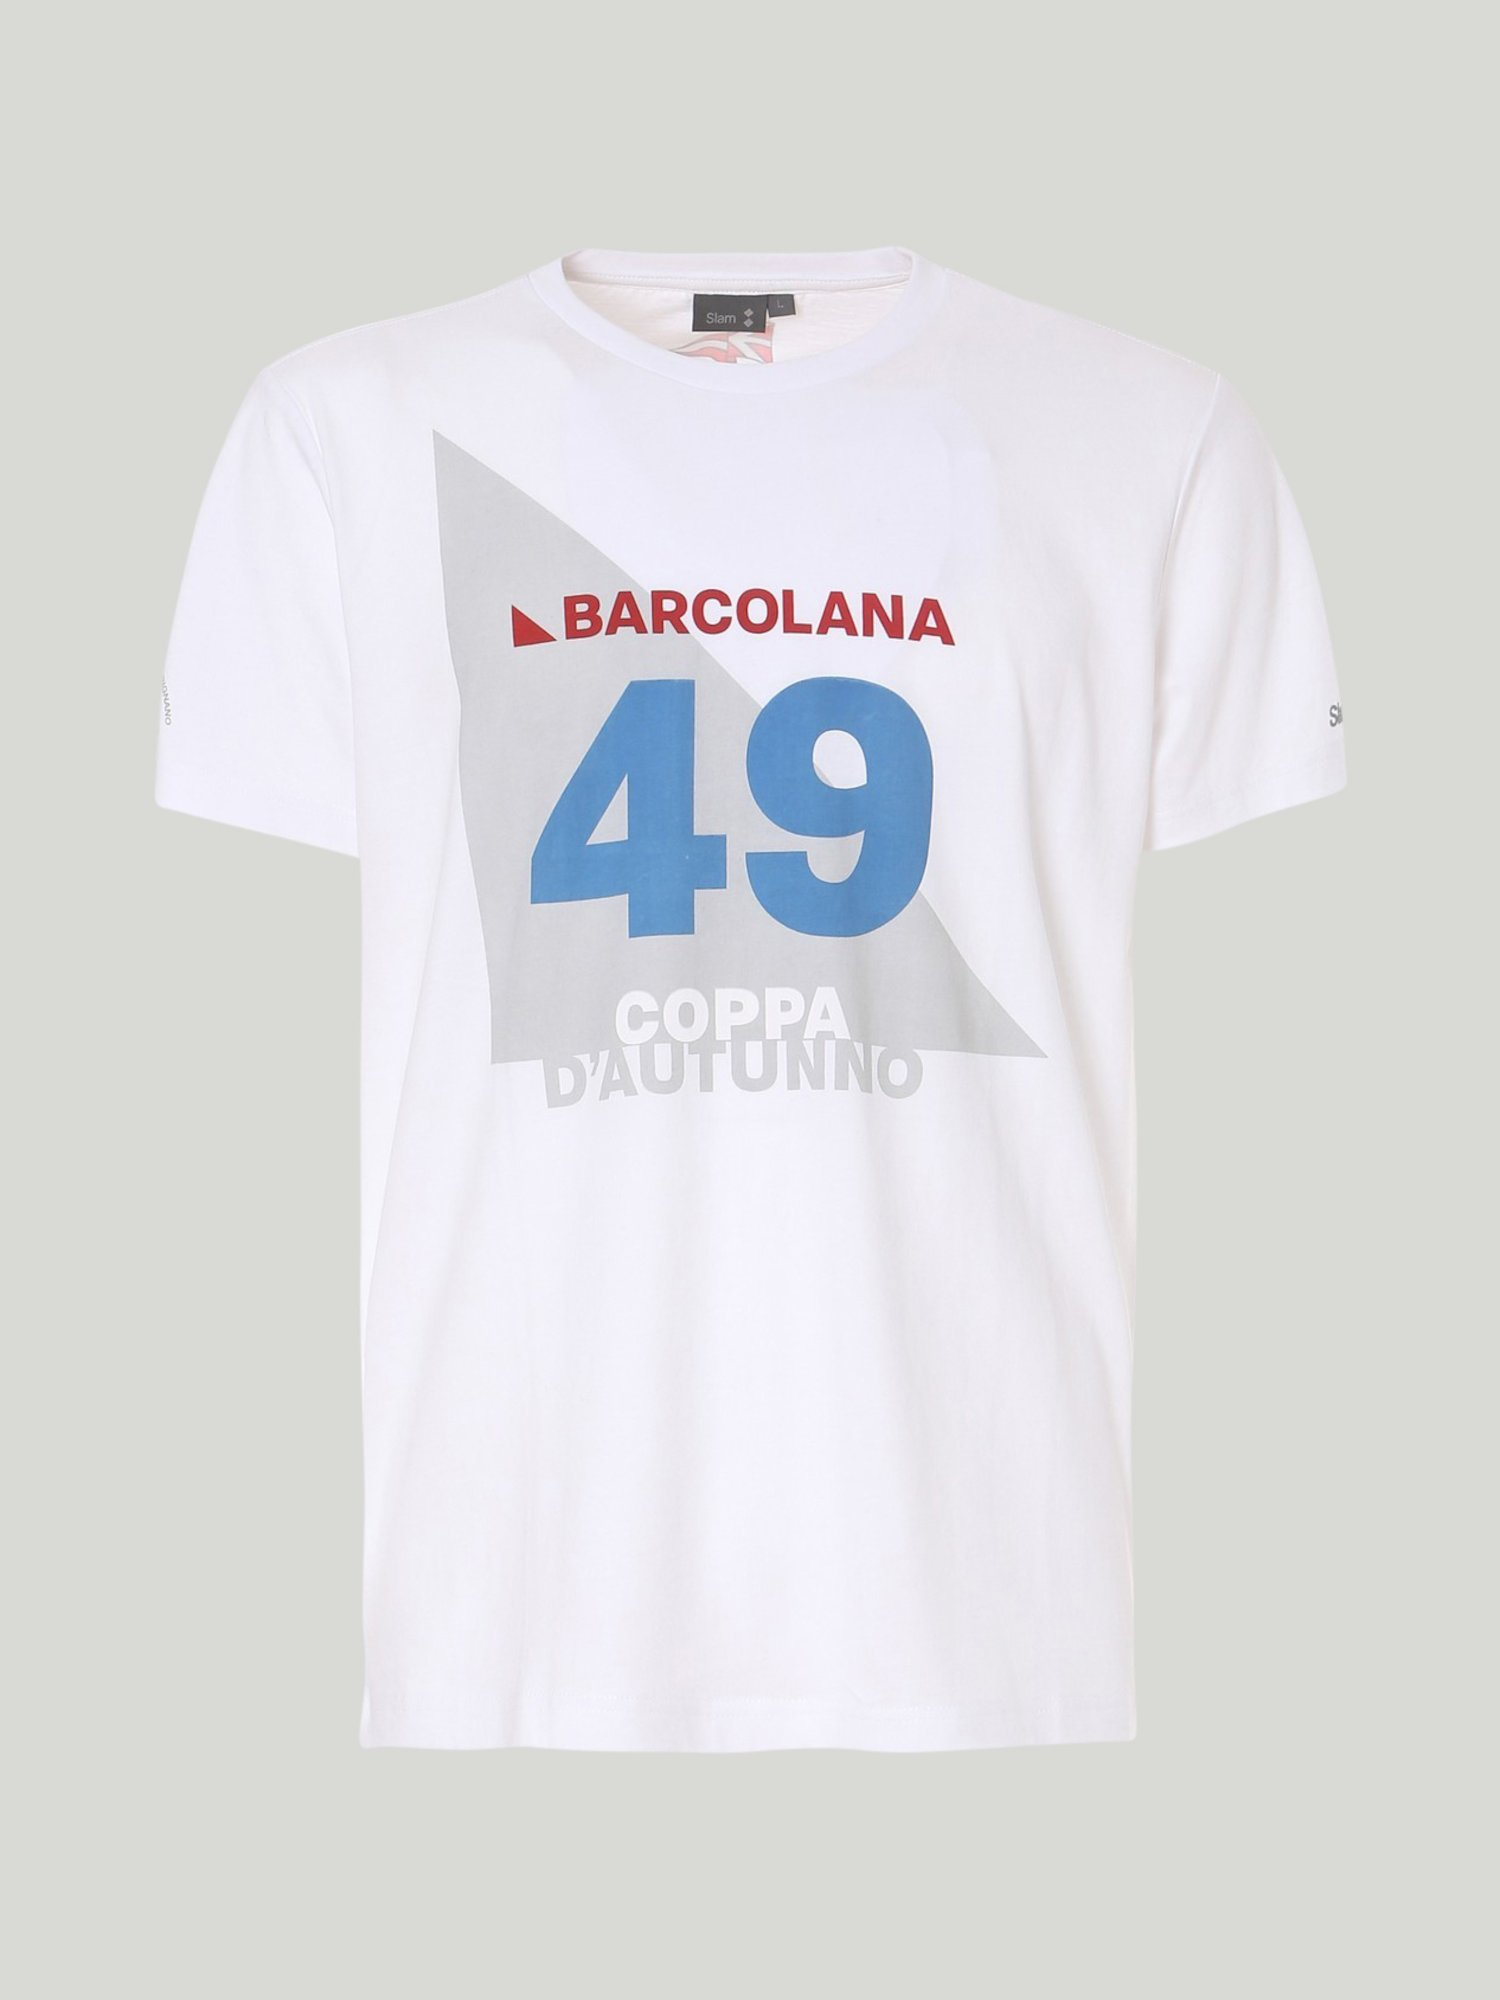 T-SHIRT 49 BARCOLANA - Blanco